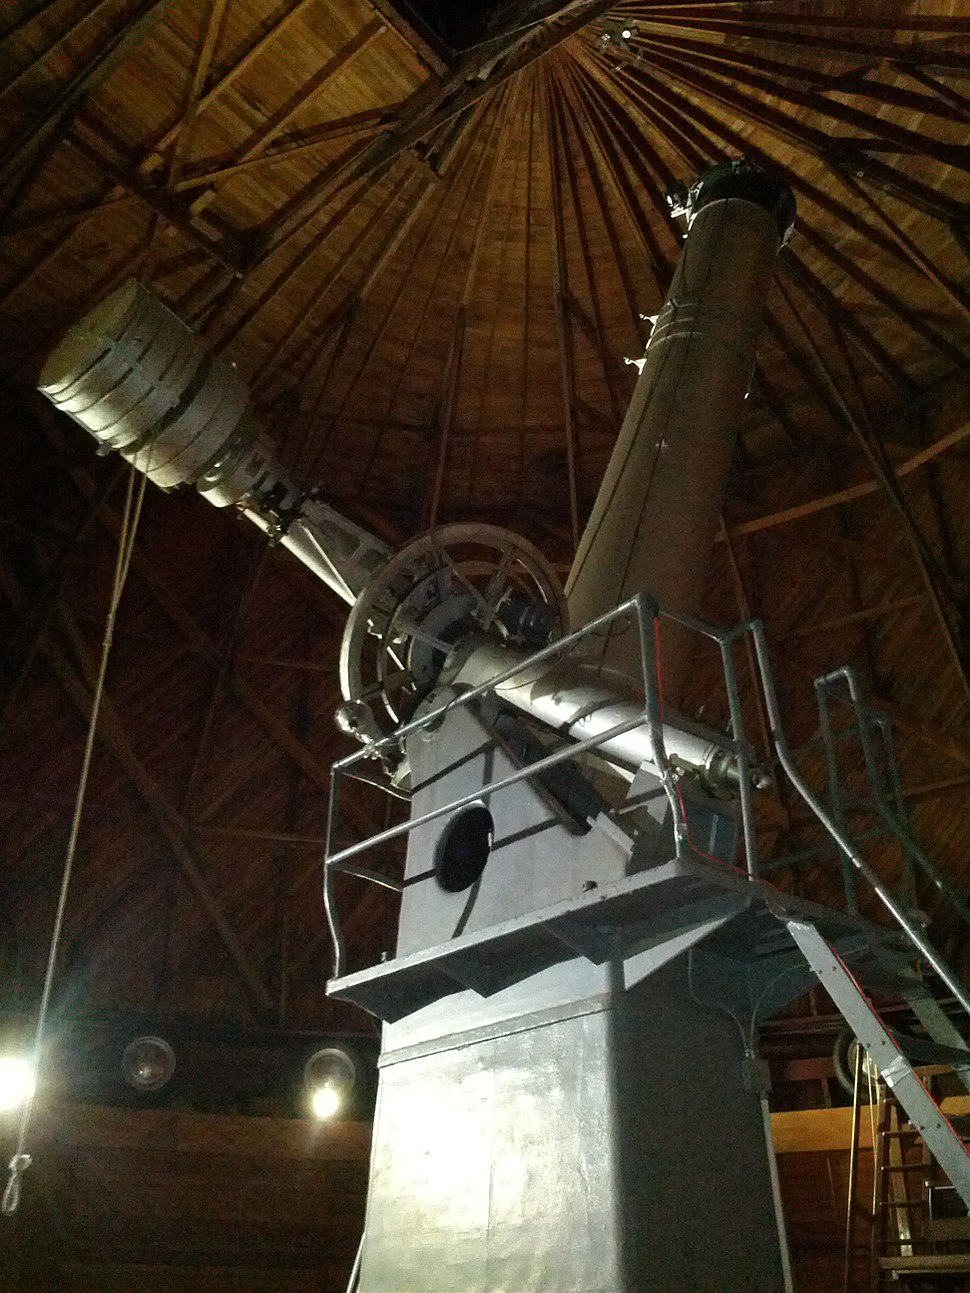 Lowell Observatory - Clark telescope